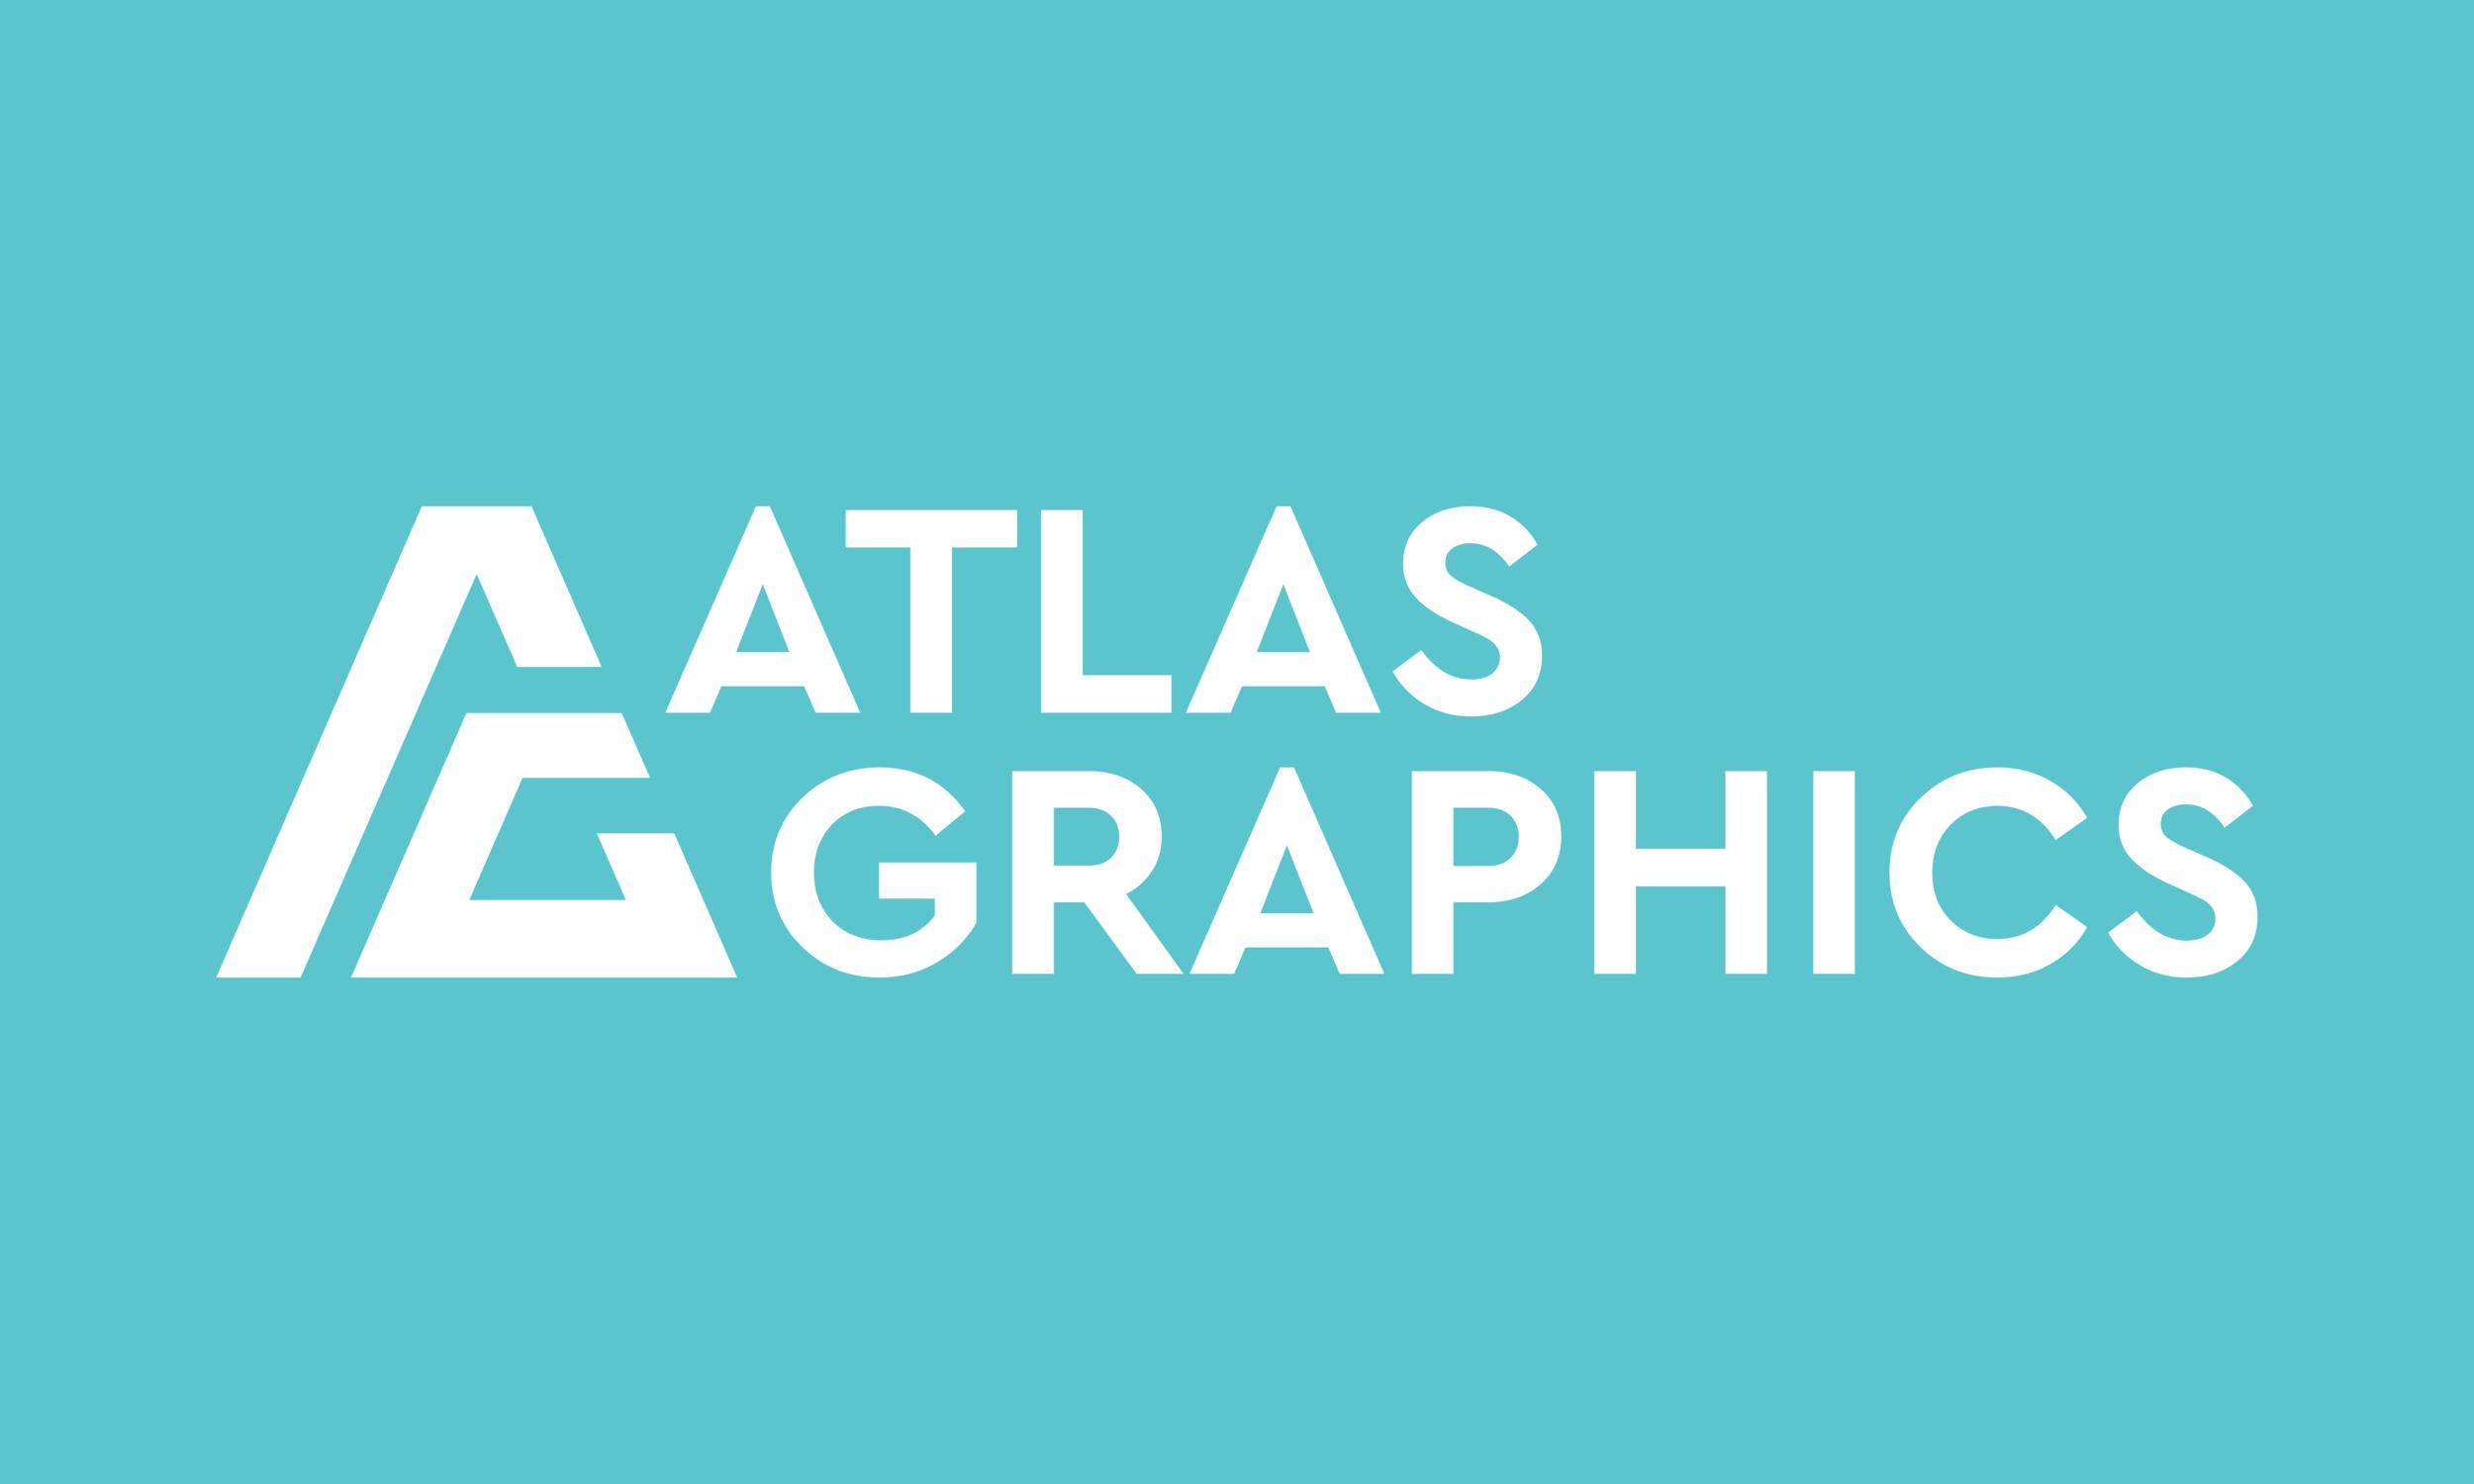 AtlasGraphics-01.png